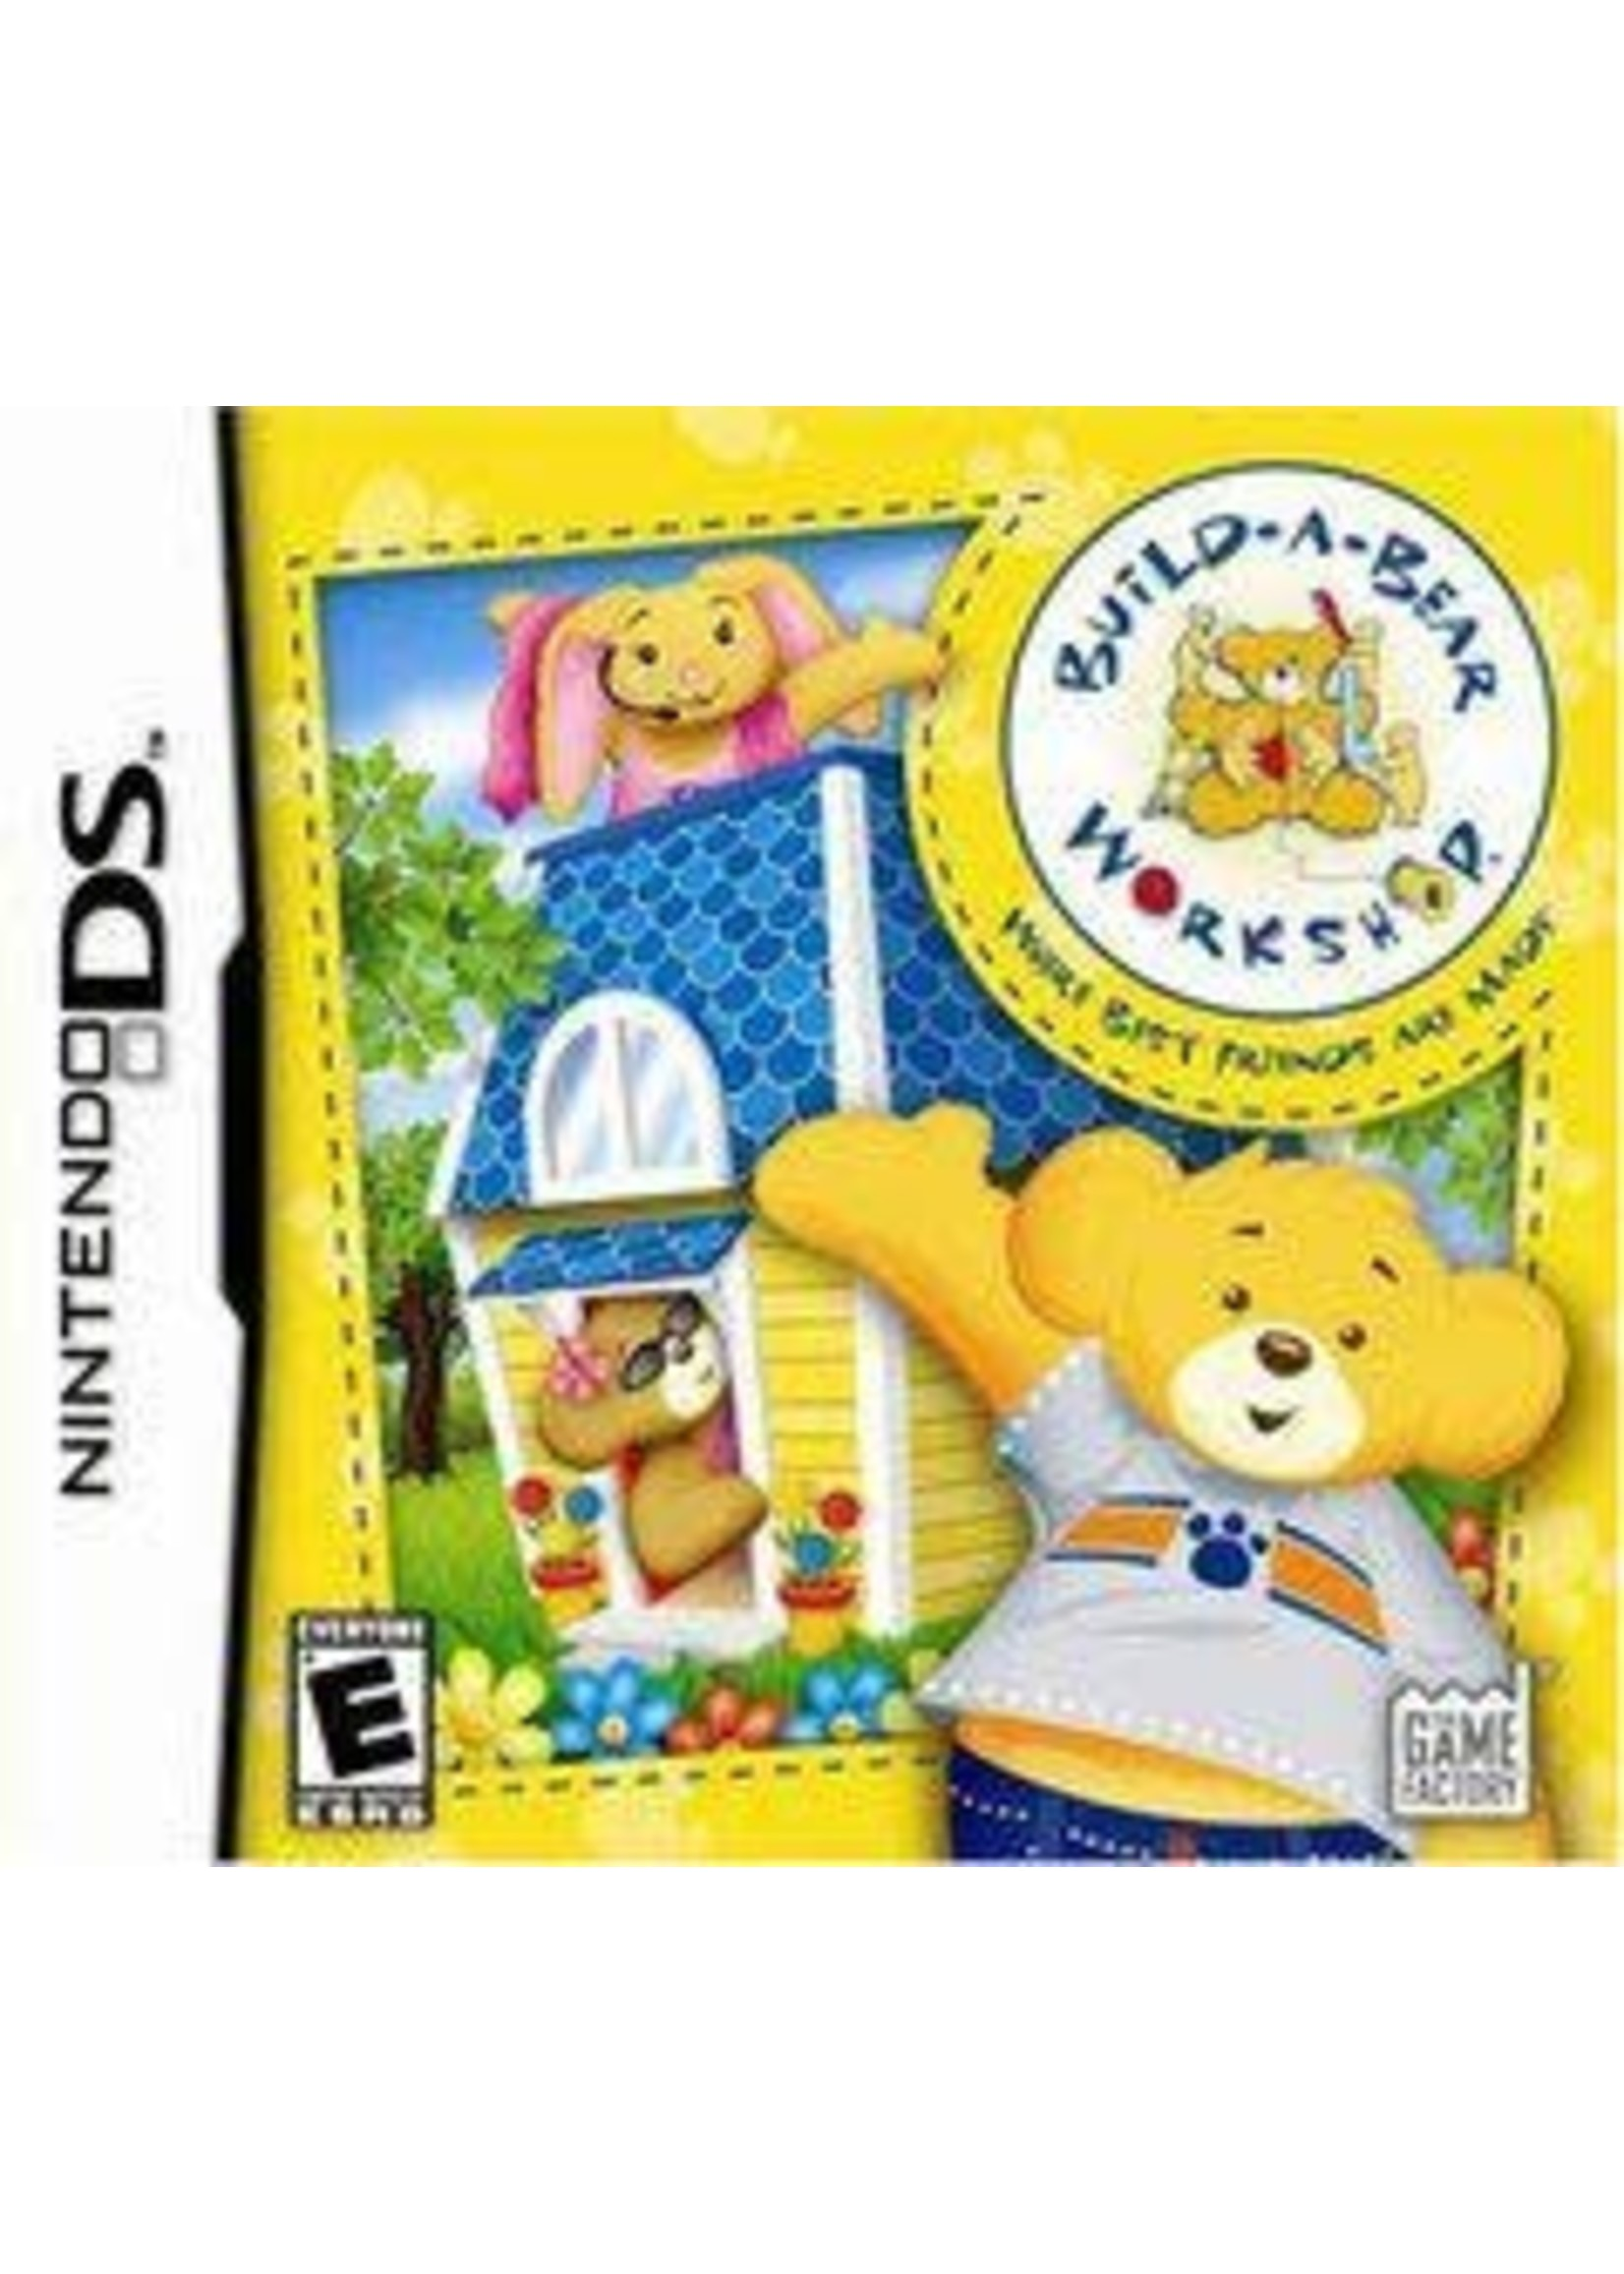 Build-A-Bear Workshop Nintendo DS